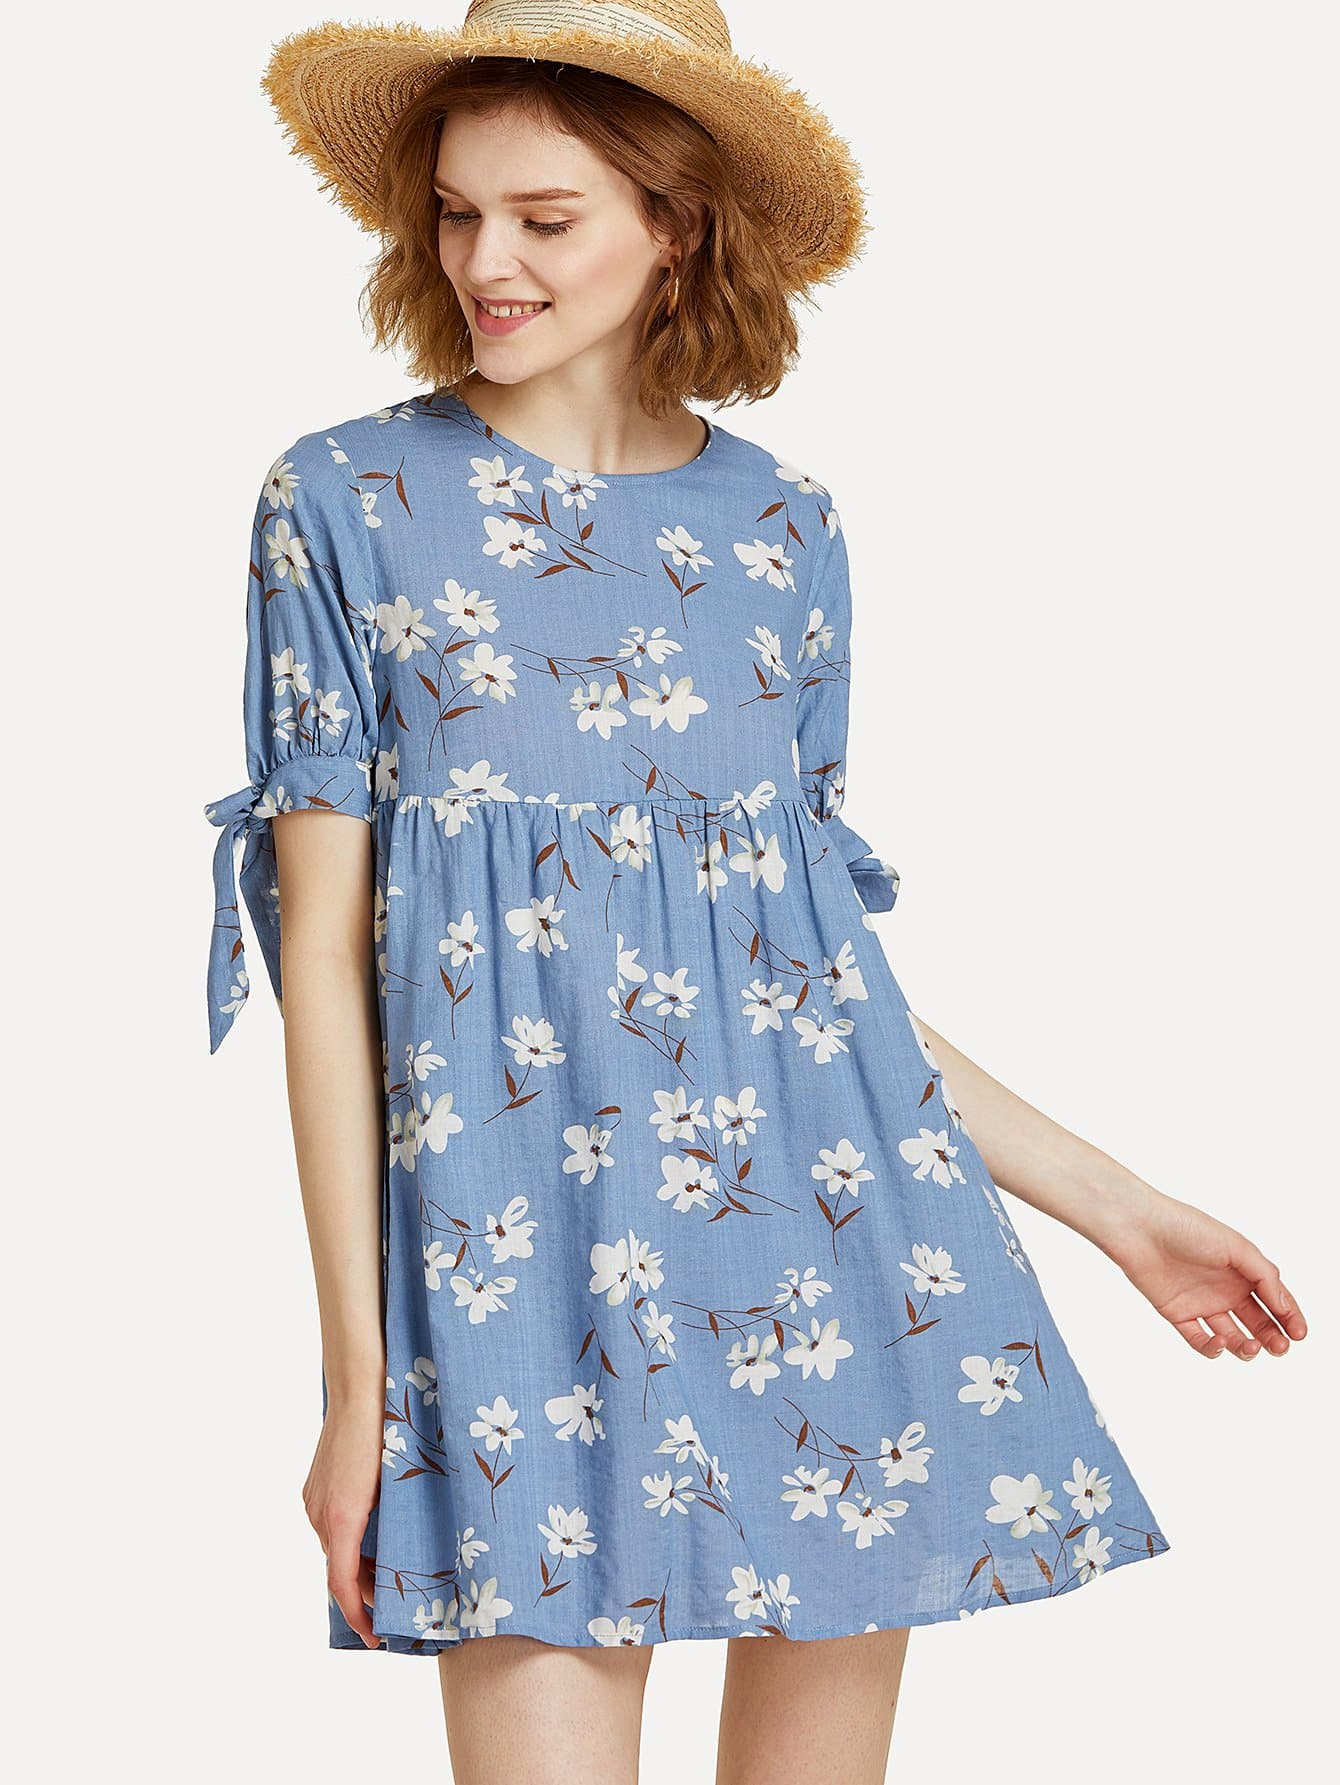 Knot Cuff Keyhole Back Floral Dress plunging neck knot back floral dress